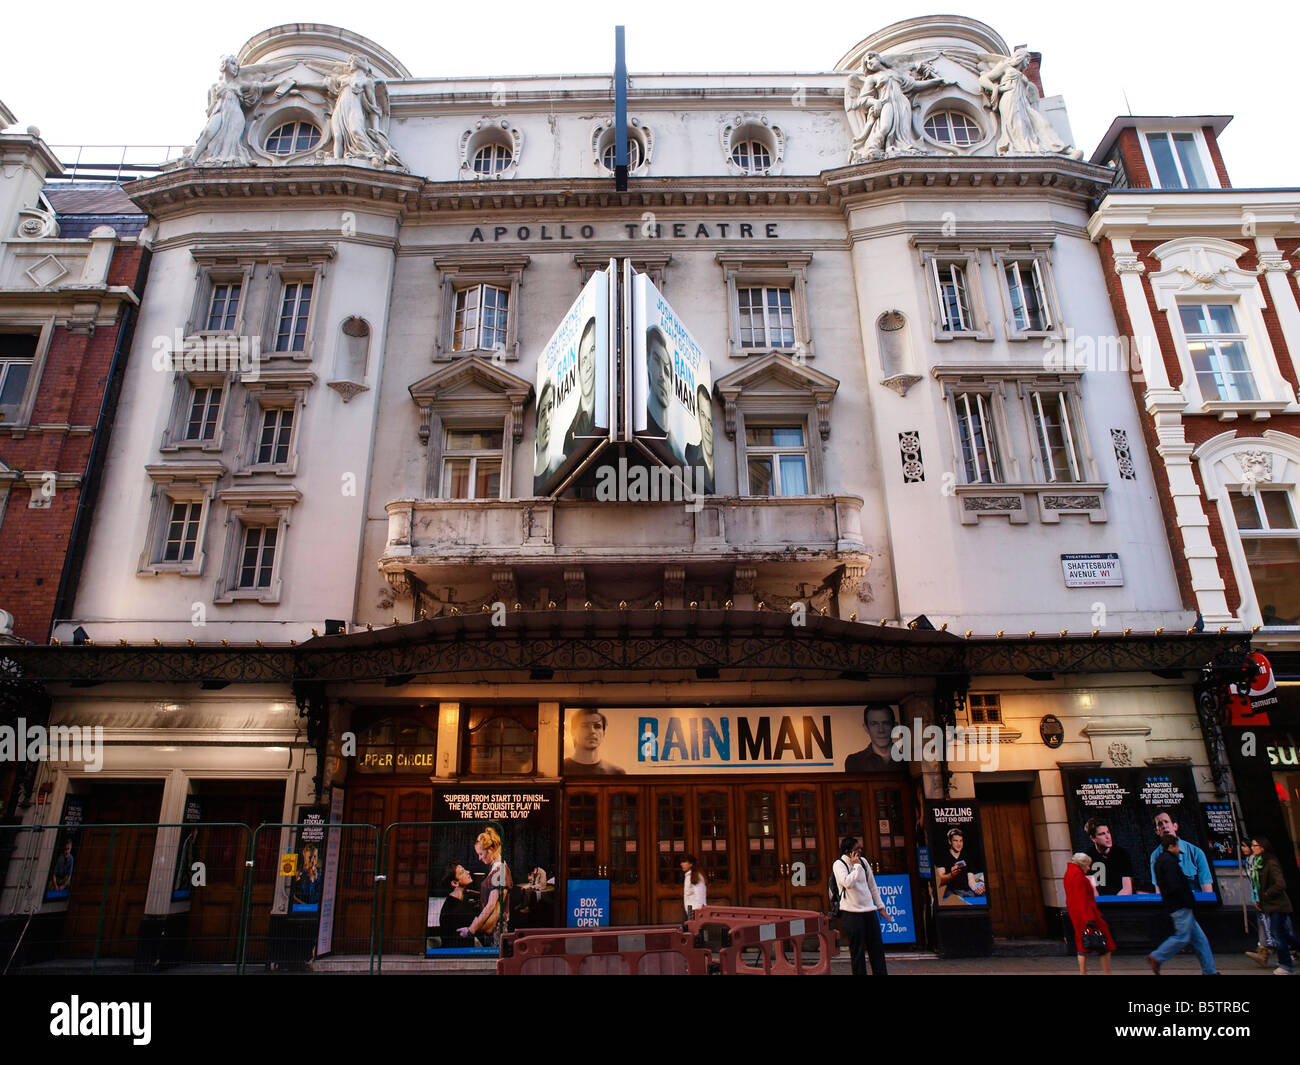 Facade of the Apollo Theatre Shaftesbury Avenue London England - Stock Image